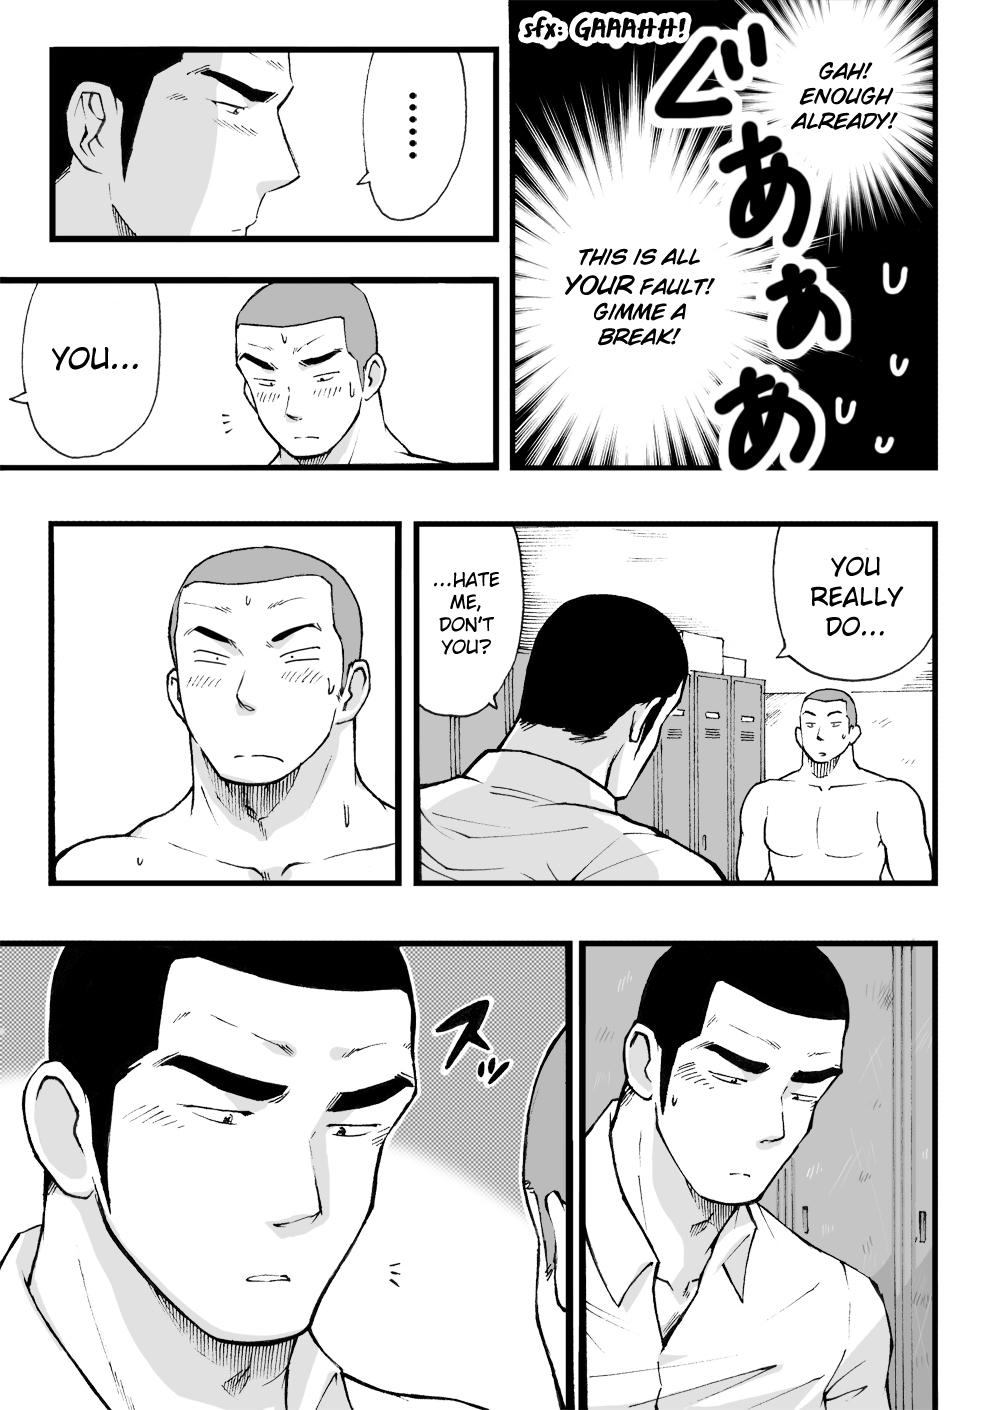 [Akahachi] Motemote Yakyuubu Otoko [Kouhen] | Popular Baseball Club Boys (Part Two) [English] [Papatez] 22